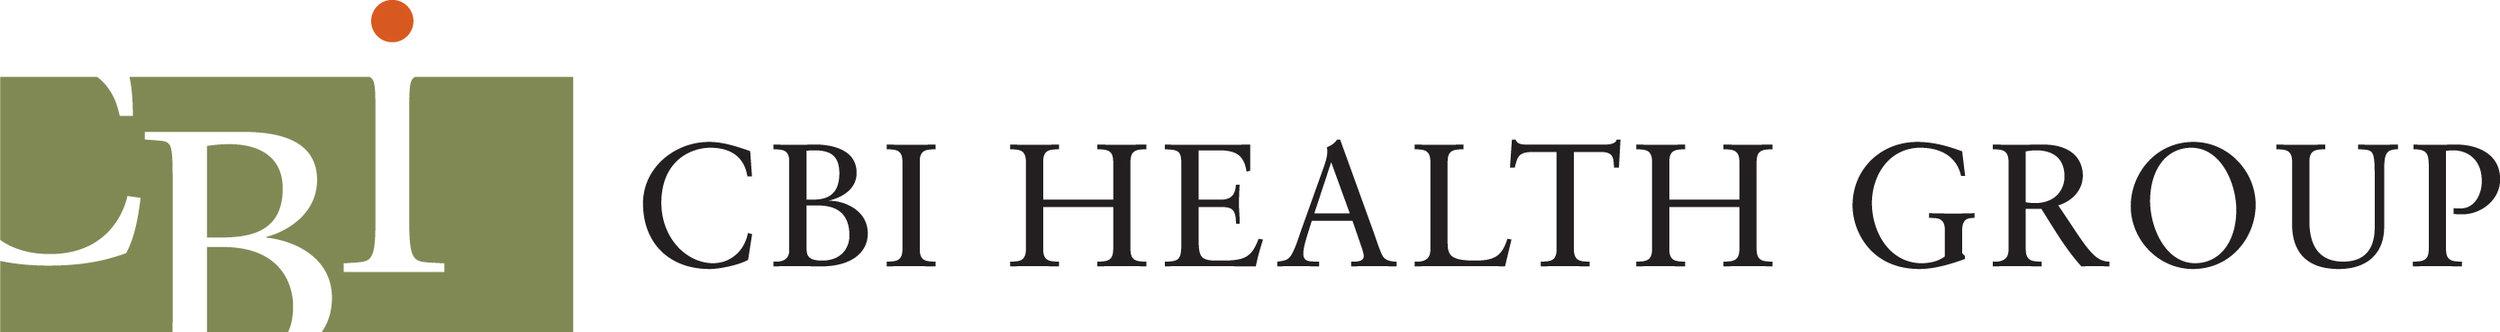 CBI-Health-Group_4-colour_Logo.jpg